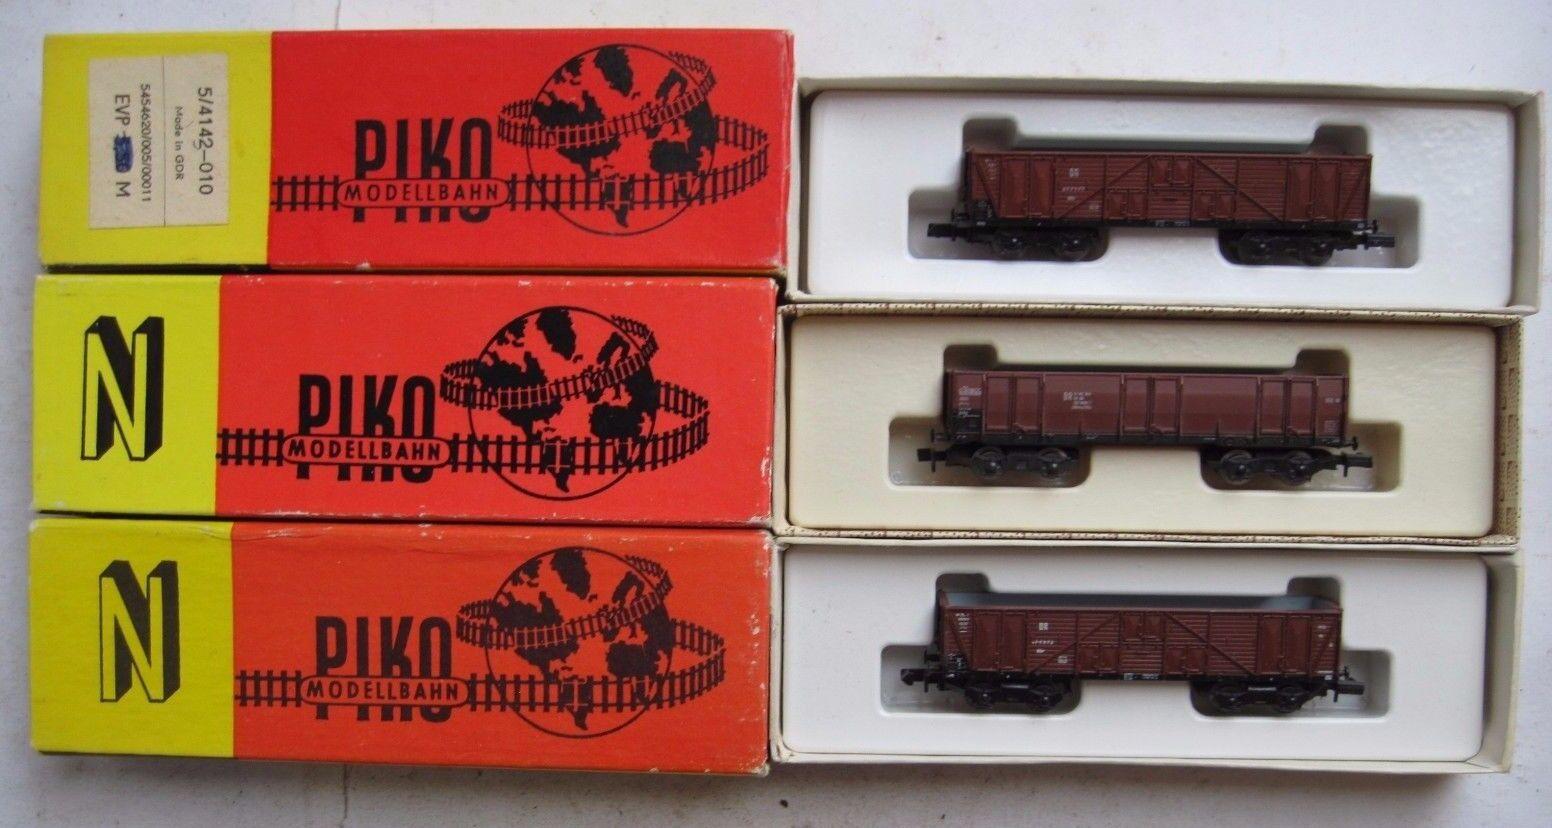 Piko 5 4142-01 Stahl + 5 4143-01 Holz DR Hochbordwagen, offen